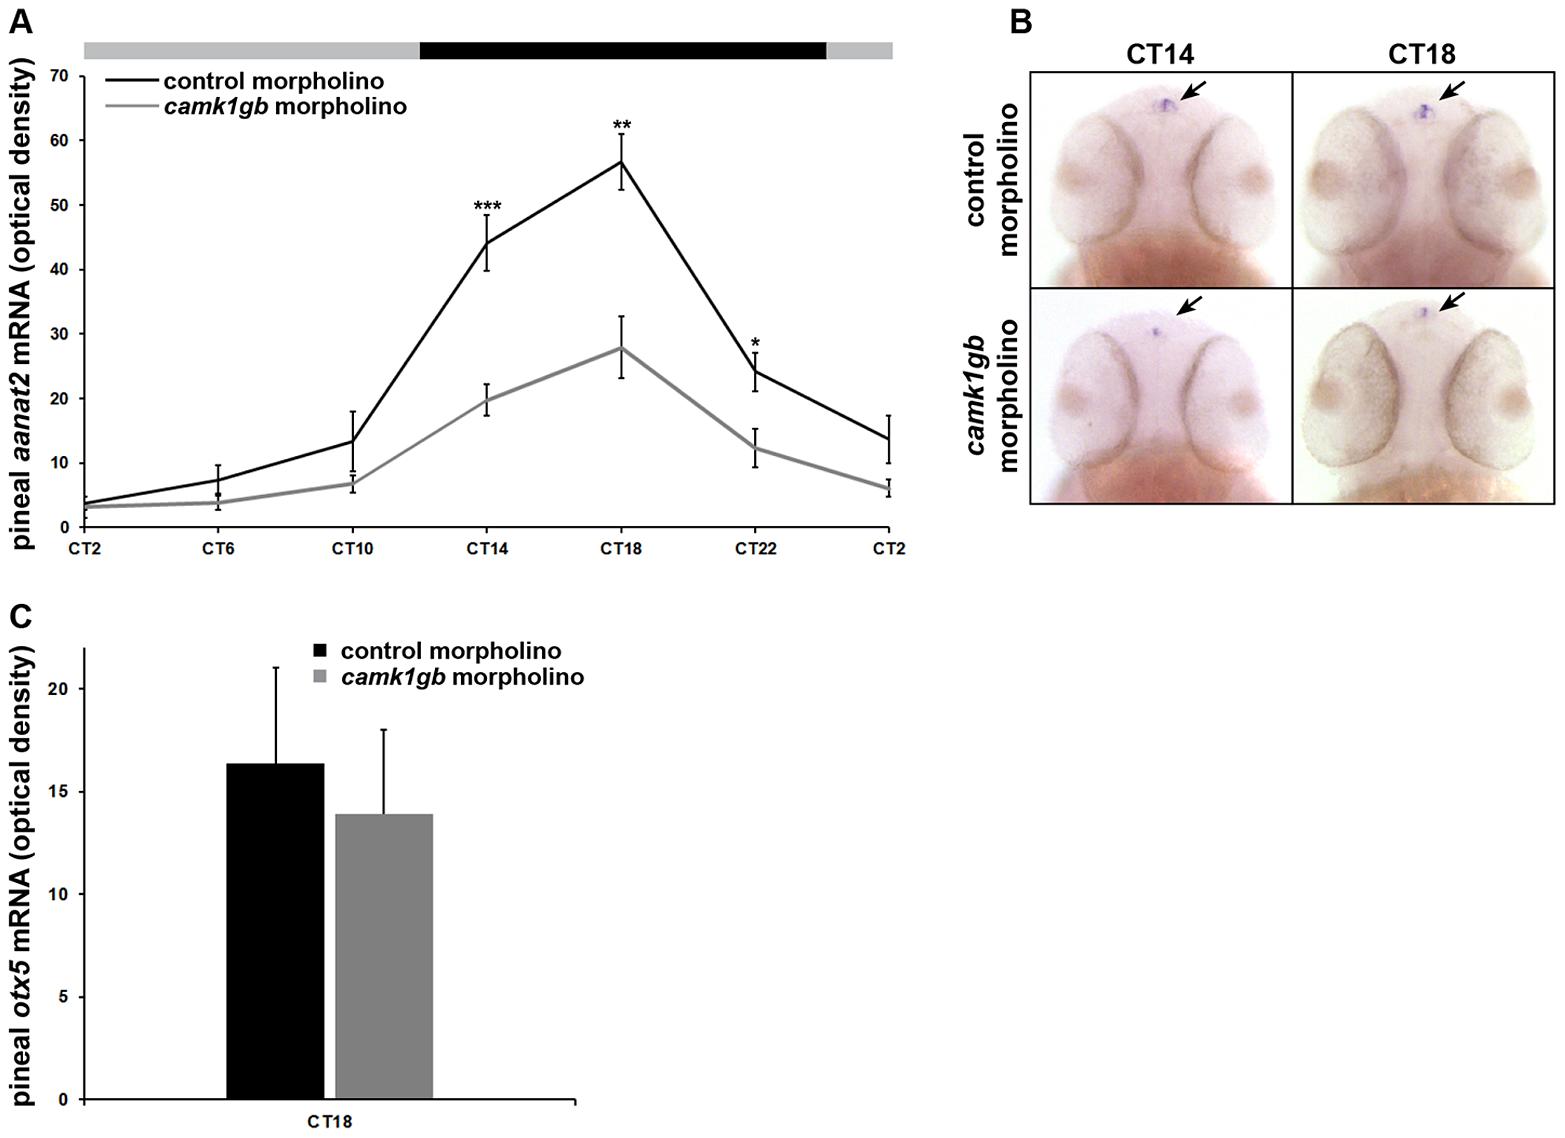 Effect of <i>camk1gb</i> knockdown on pineal <i>aanat2</i> and <i>otx5</i> mRNA rhythms.